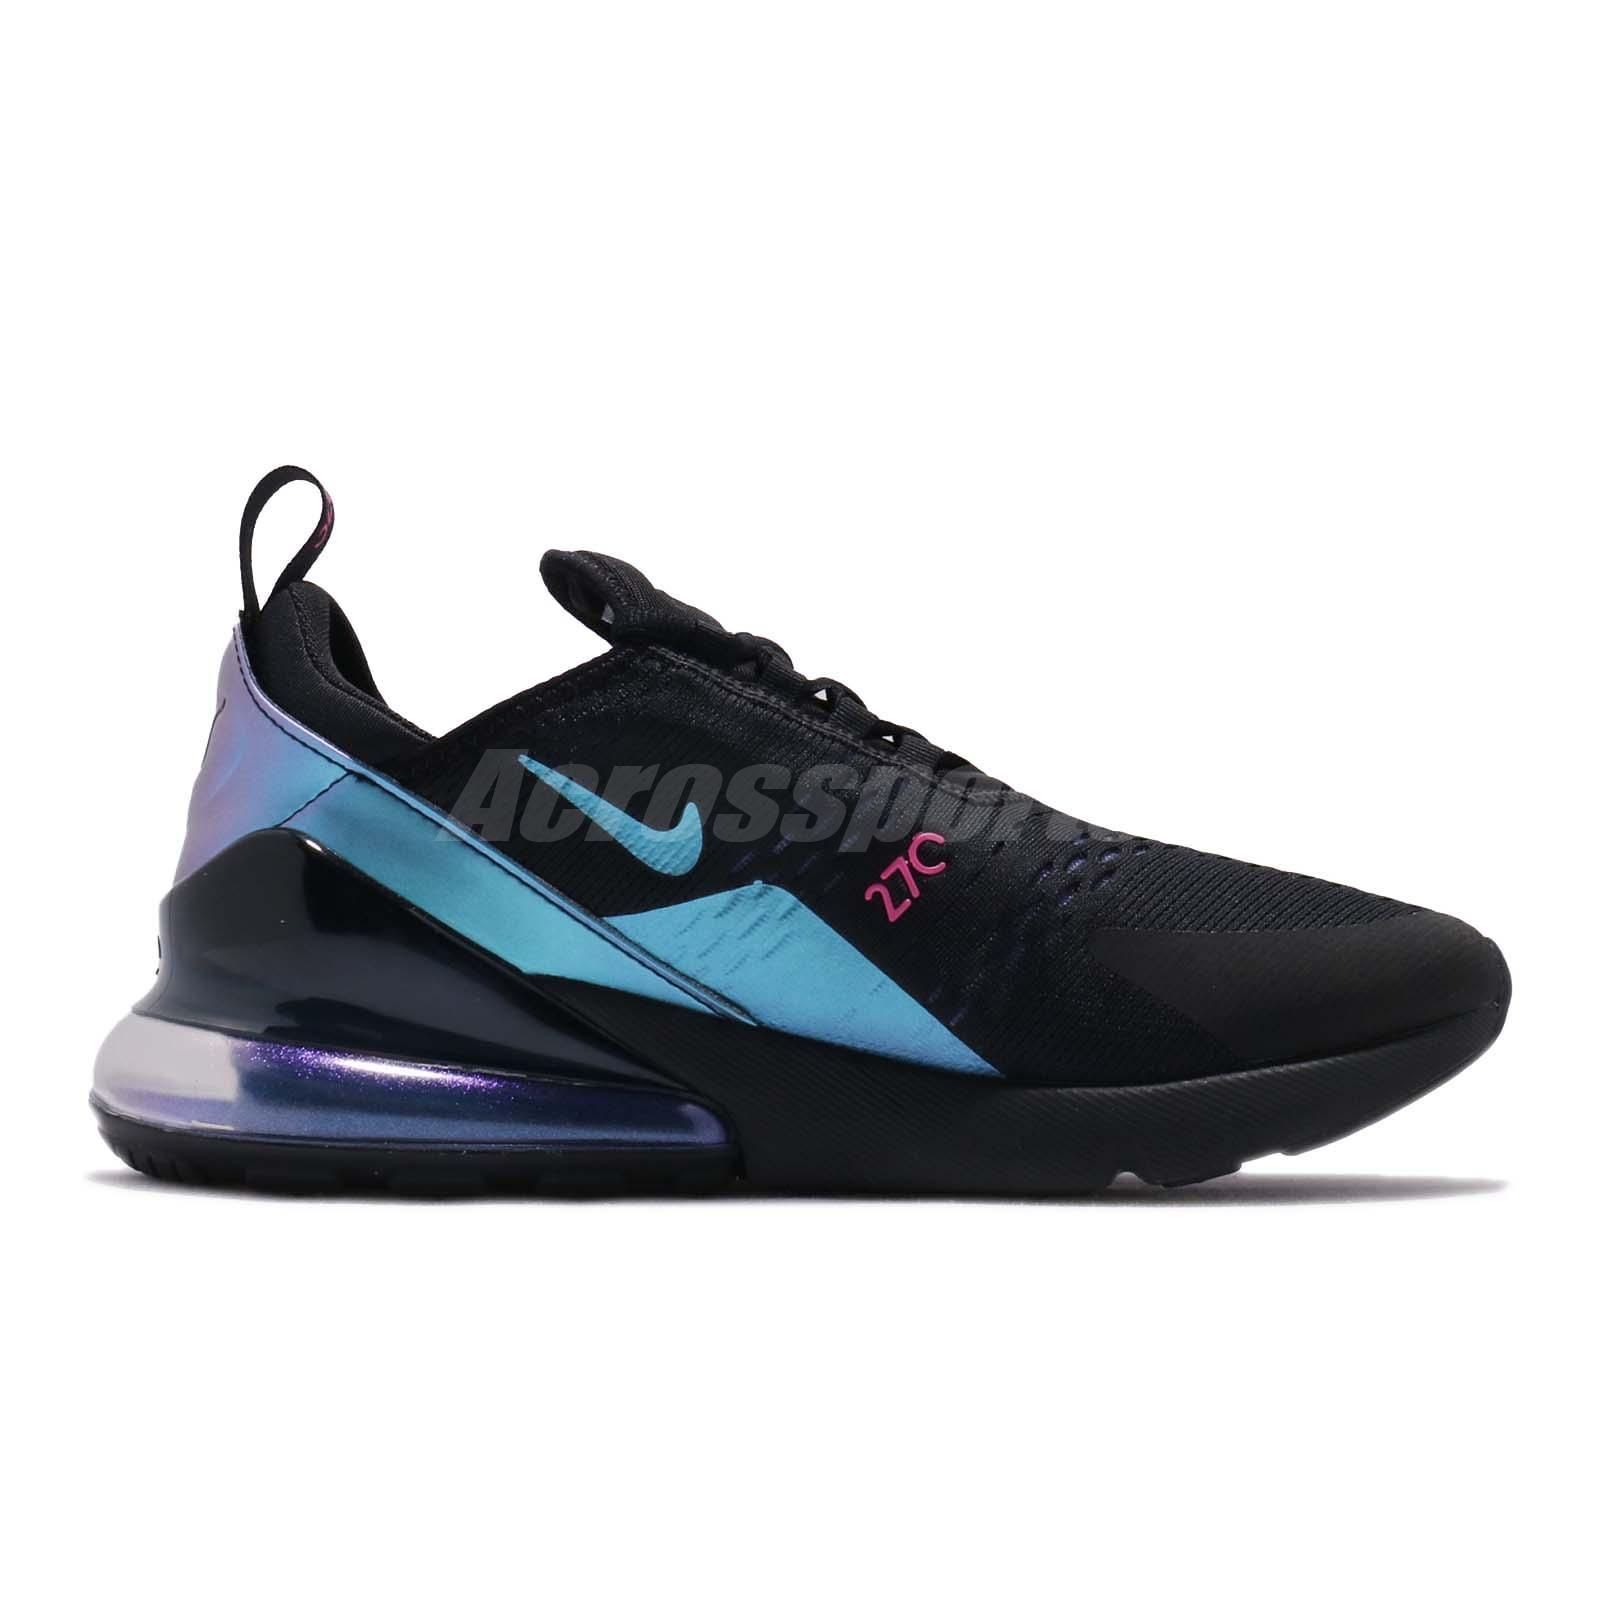 Details about Nike Air Max 270 Throwback Future Black Laser Fuchsia Purple Men Shoe AH8050 020